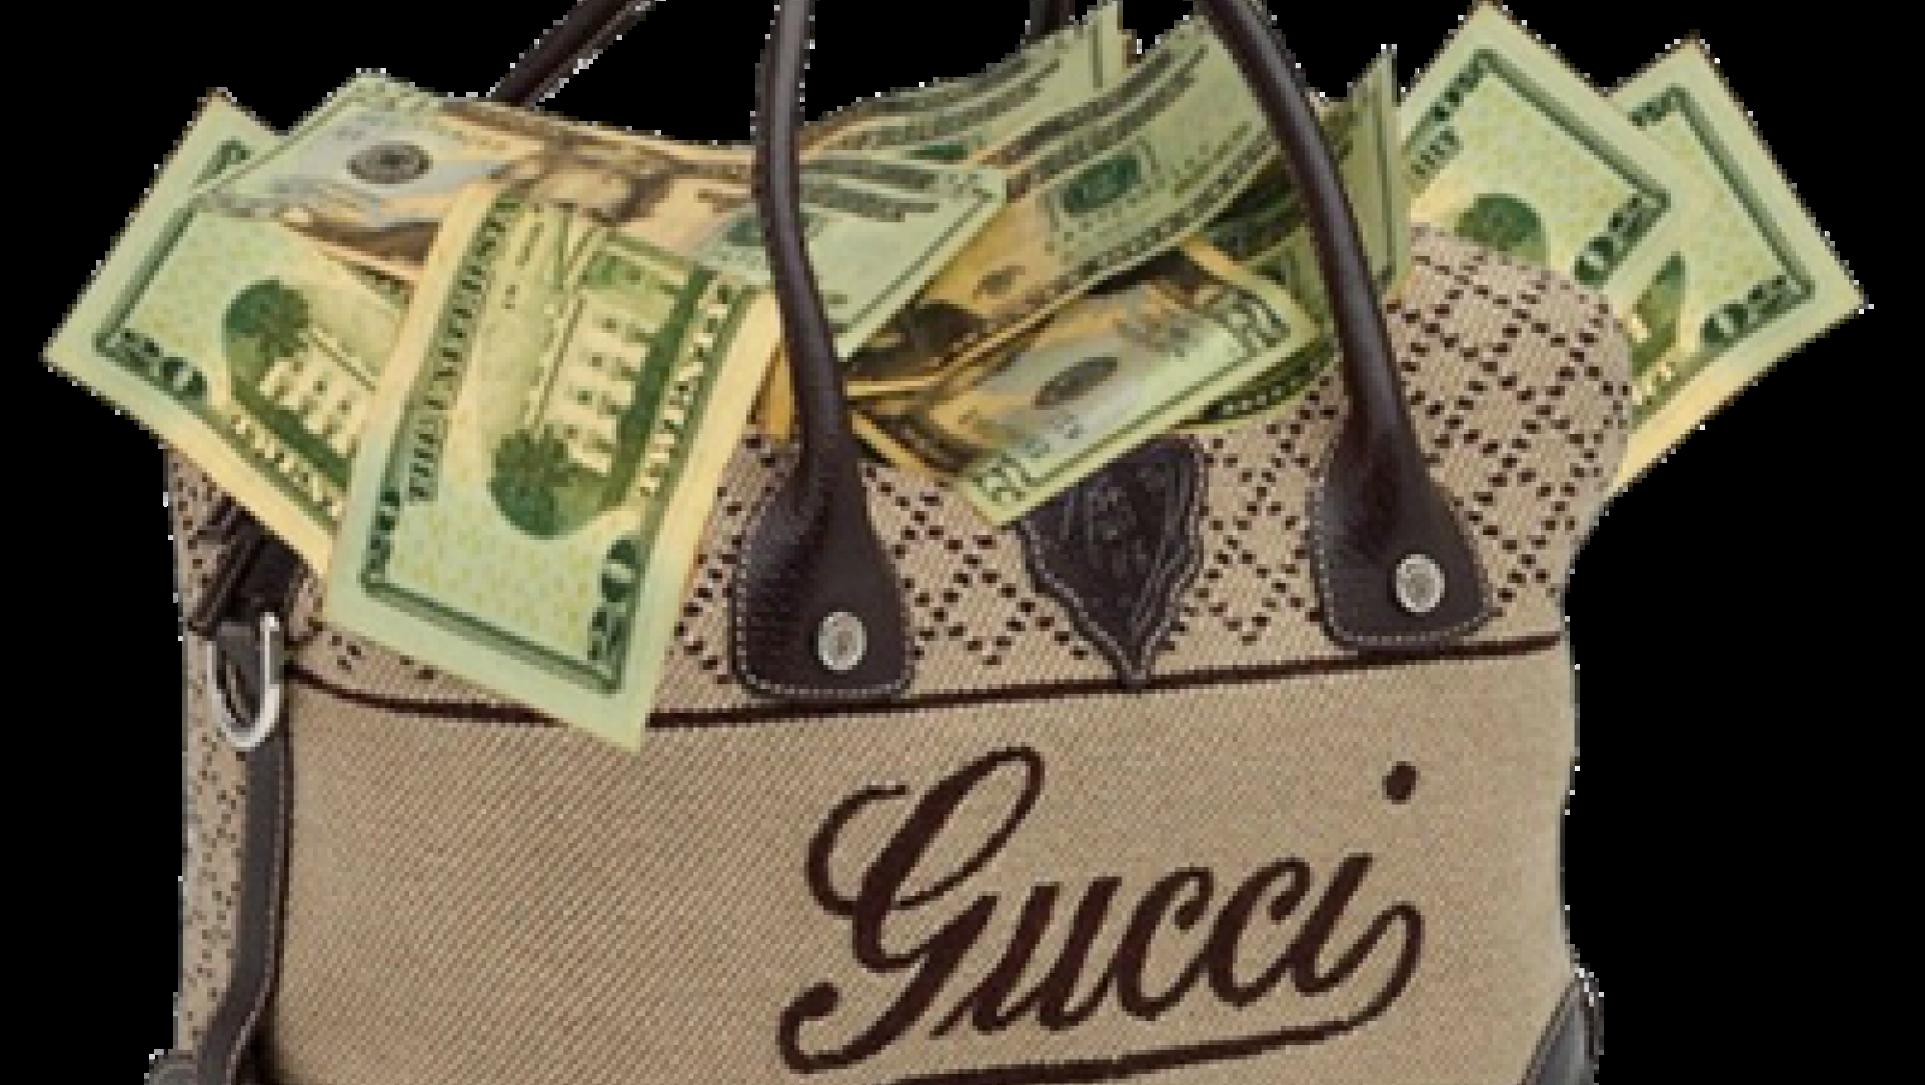 Hd Money Logo Transparent Dollar Bag Icon Png Free | Spin ... - Dollar Sign Money Bag